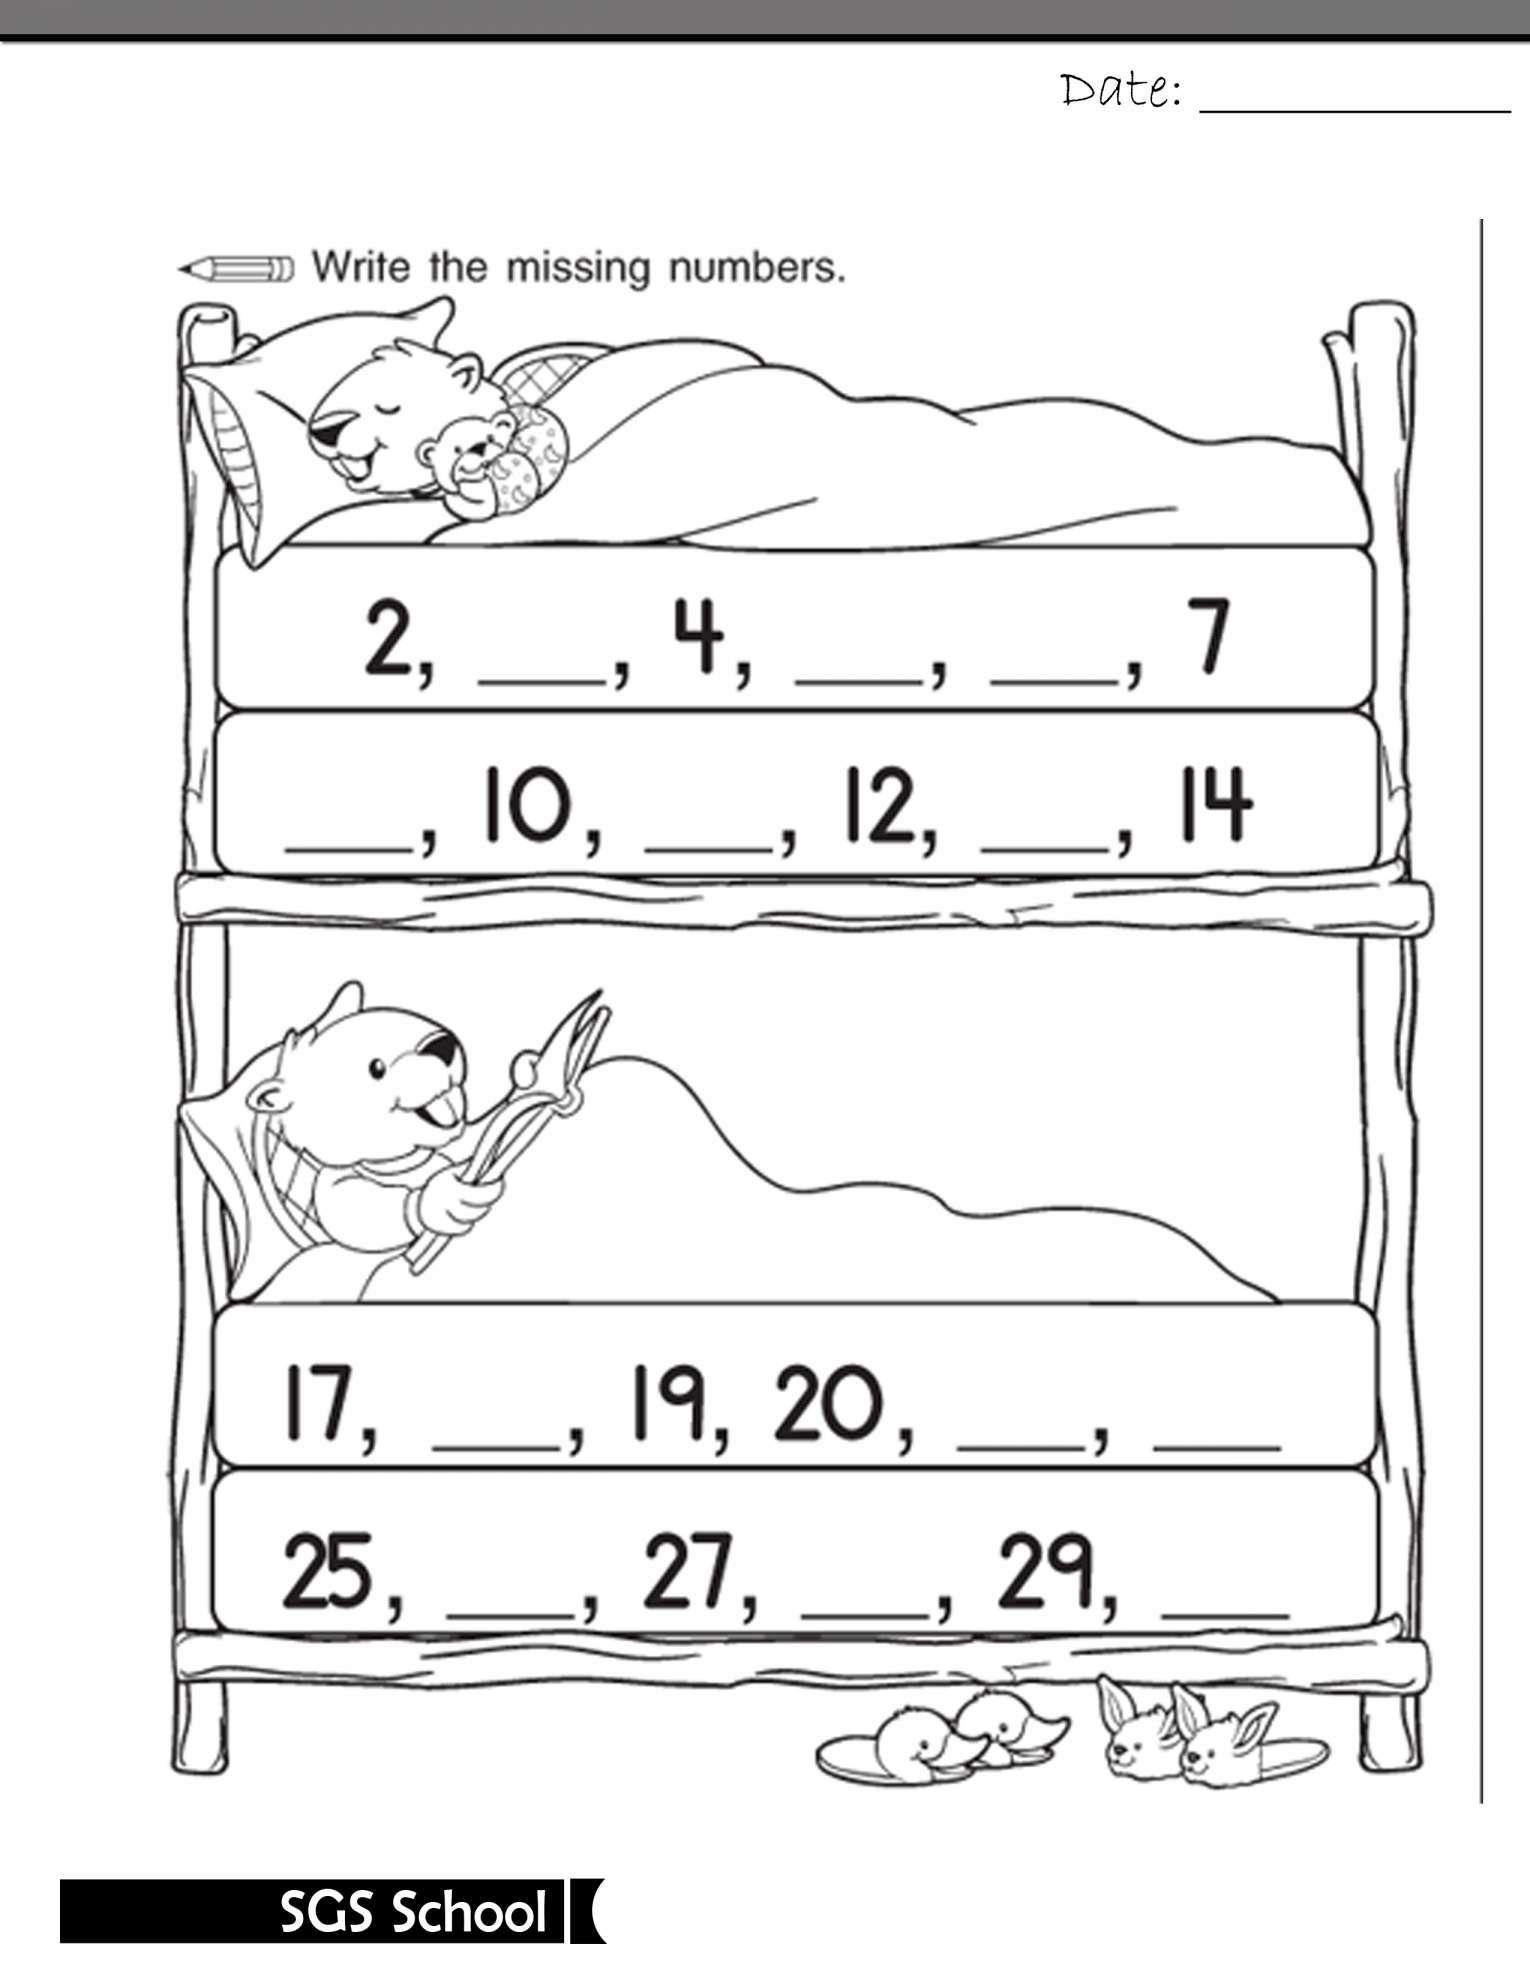 Urdu Worksheet For Kindergarten And Worksheet Of Urdu For Playgroup Kindergarten Math Free Kindergarten Math Kindergarten Math Worksheets Free [ 1980 x 1530 Pixel ]